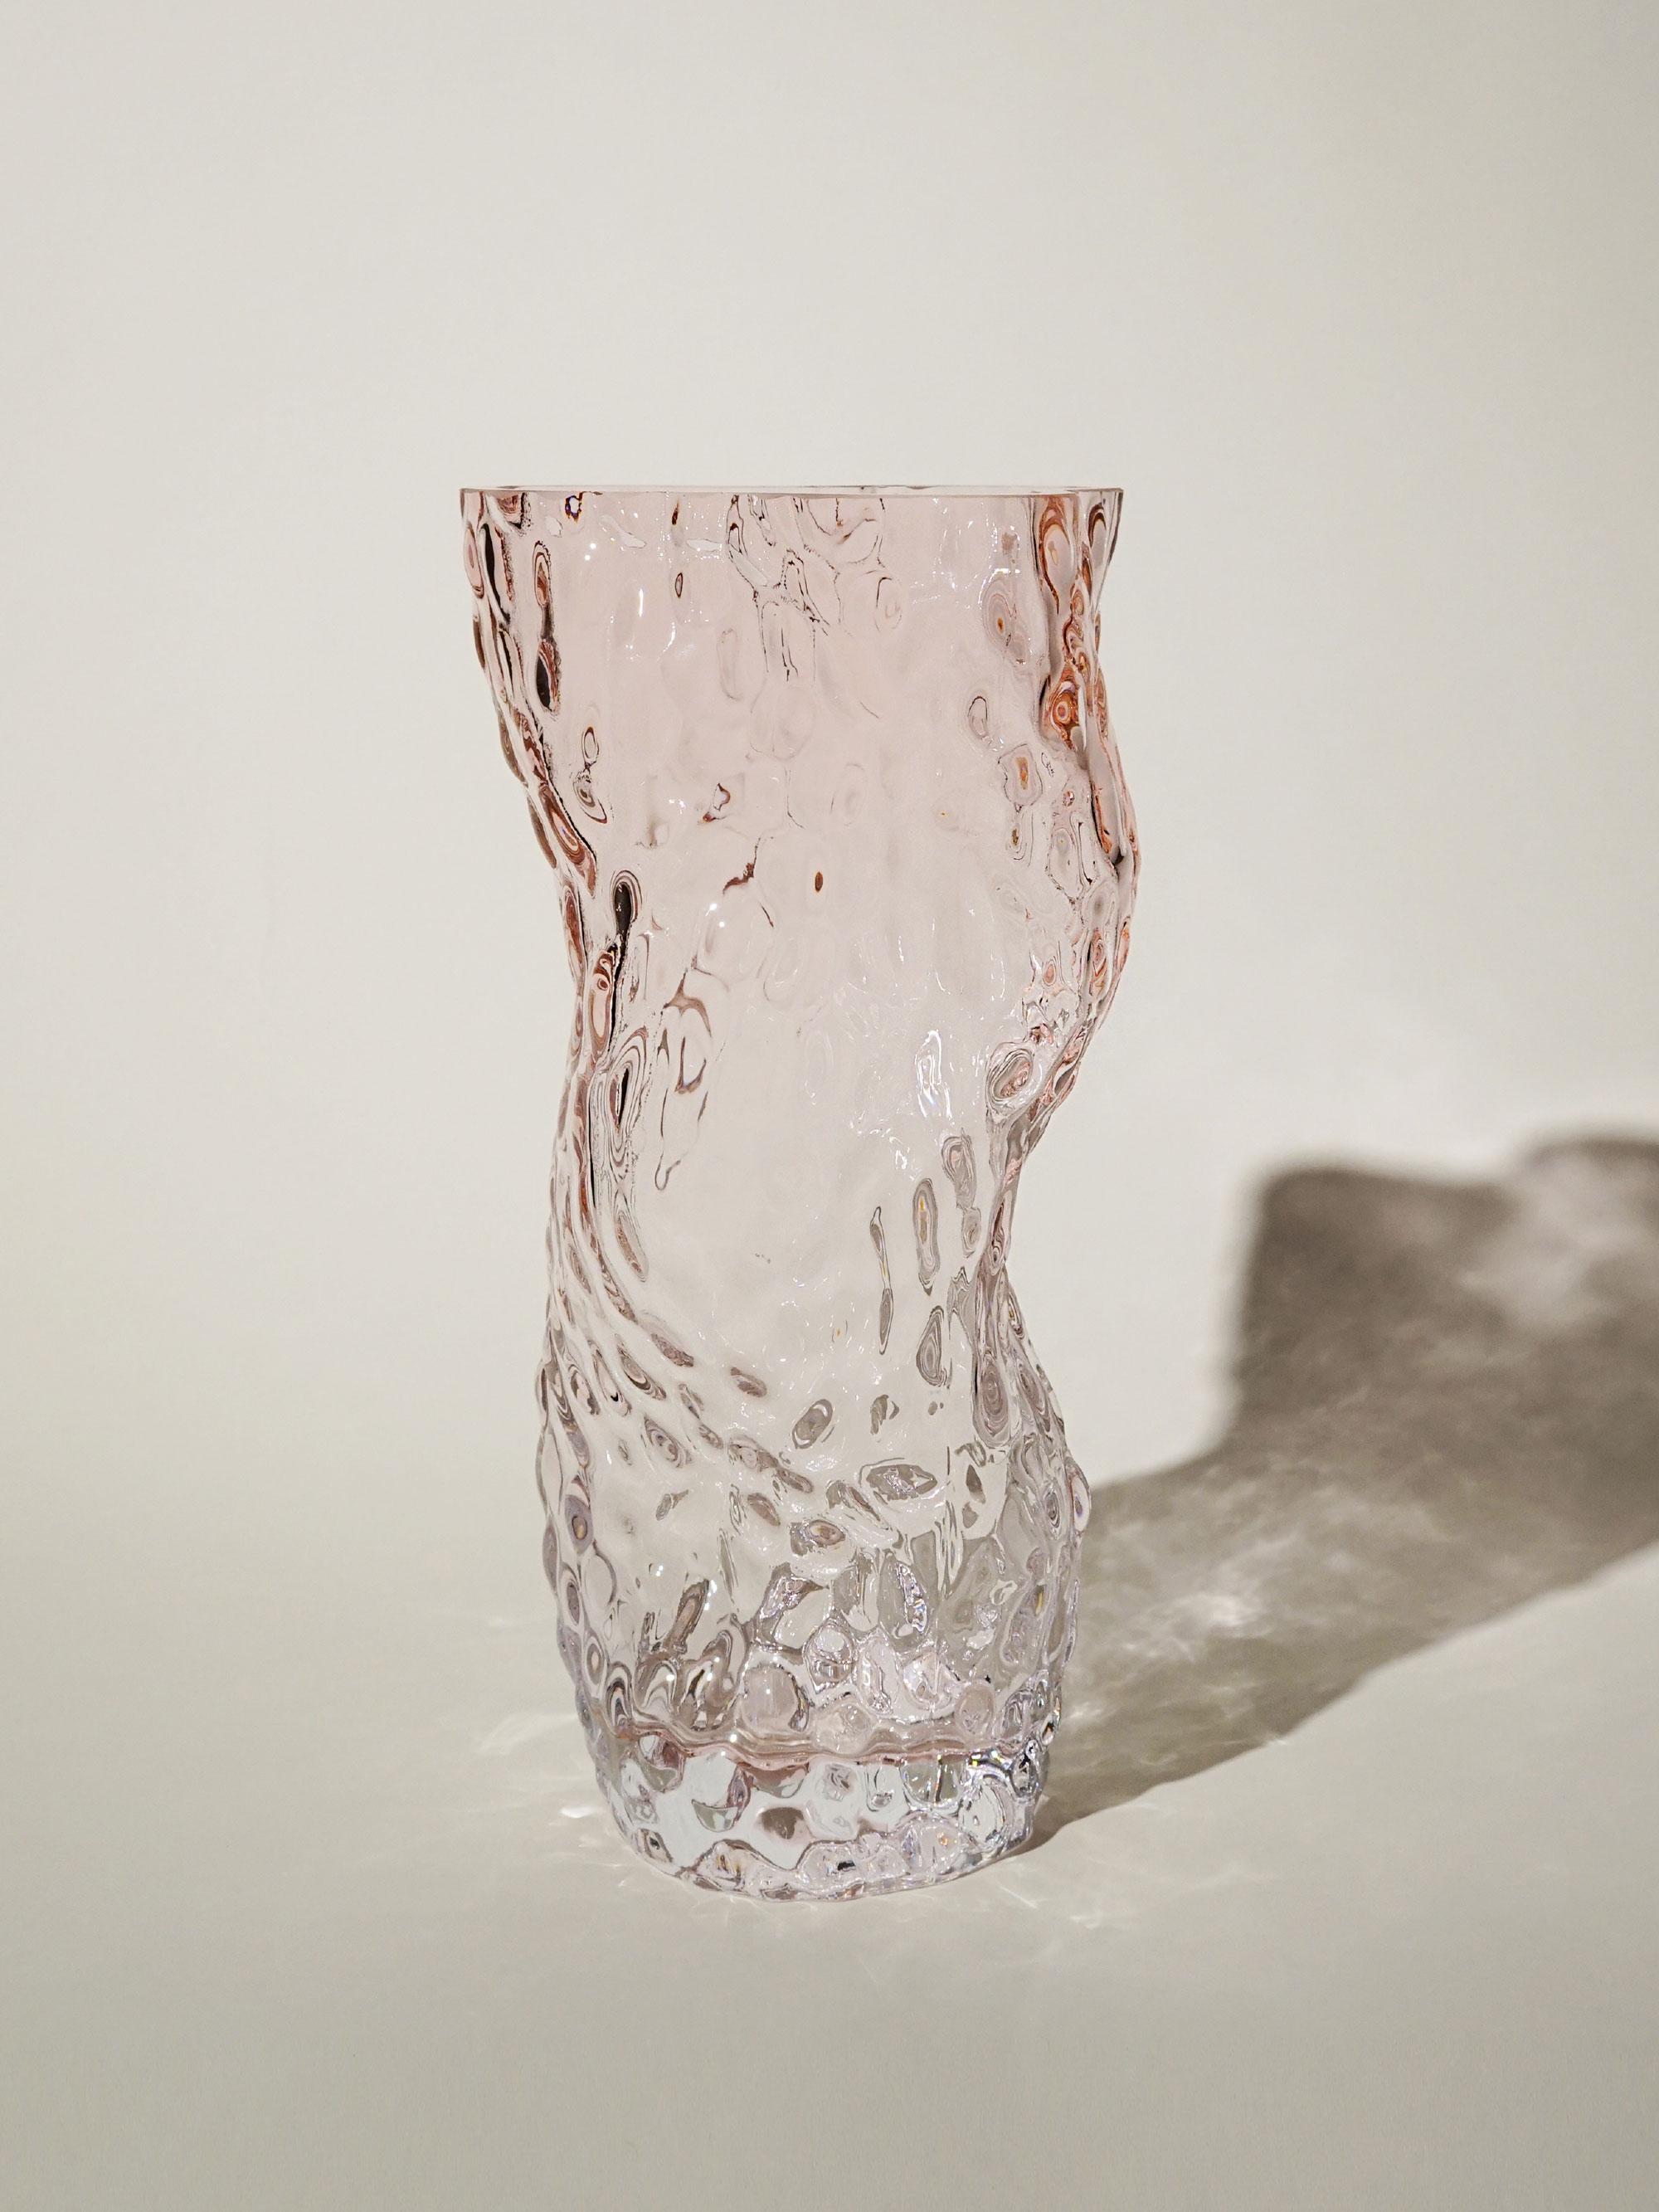 34451_7e7fd807b0-ostrea-rock-glass-vase-pale-rose-hein-studio-zoom.jpg